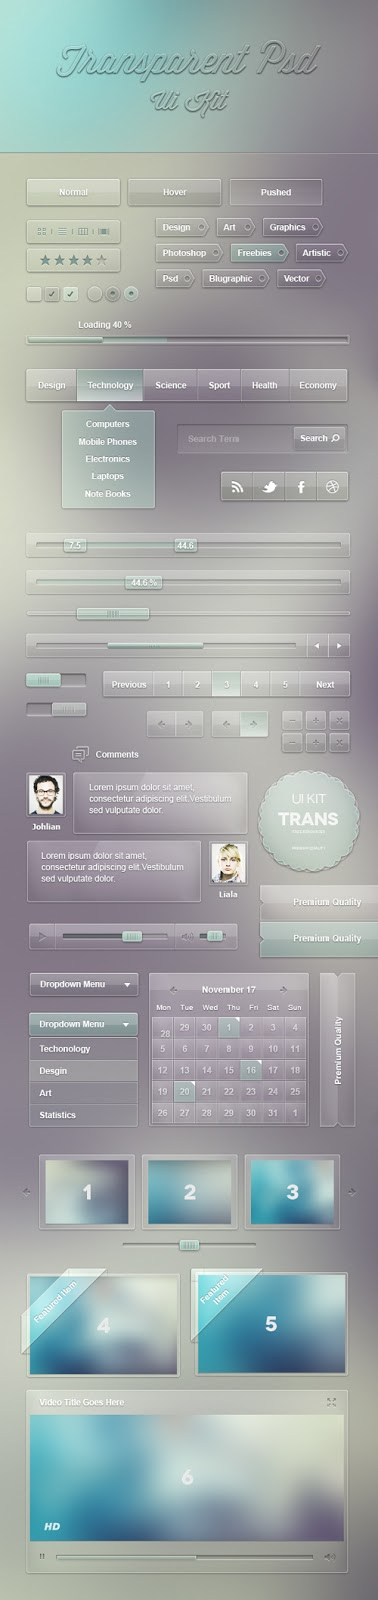 http://1.bp.blogspot.com/-EVylMGfJJvA/UexIUoEZ4eI/AAAAAAAASOk/H_ShiNFdxgc/s1600/Transparent-Ui-Kit-Psd.jpg